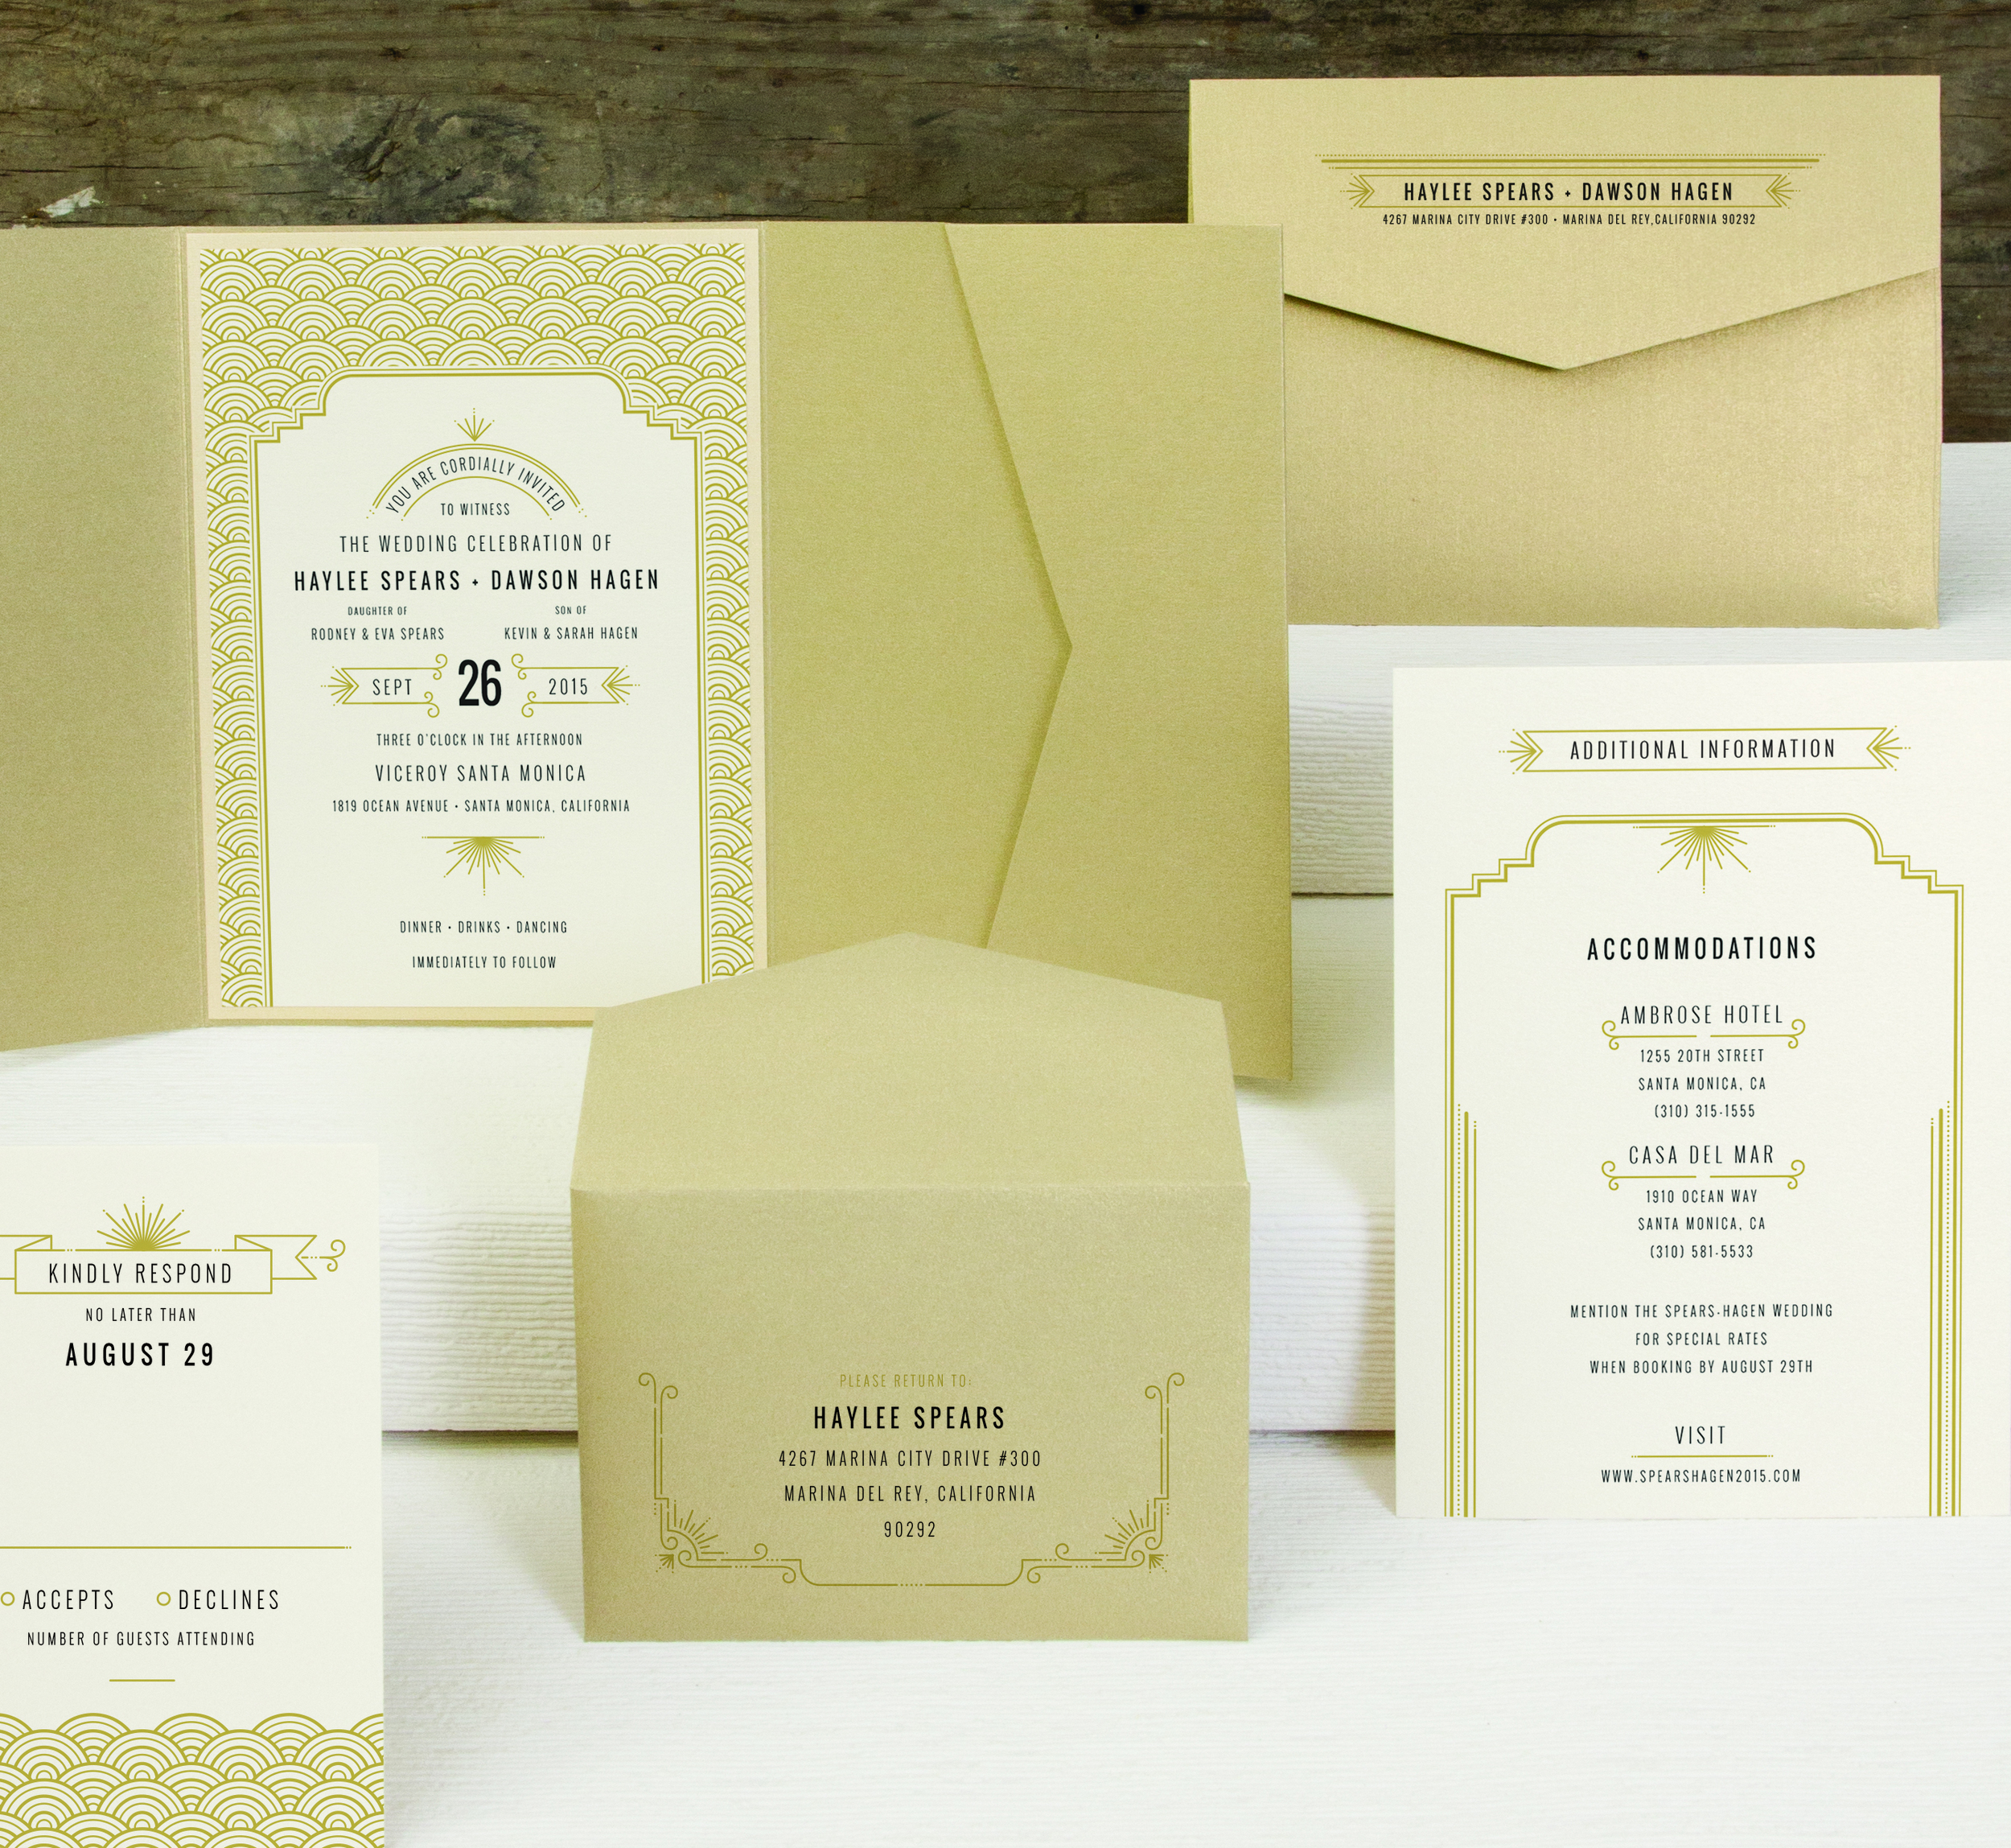 envelopments-wedding-album-gatsbyesque-img2083cut.jpg